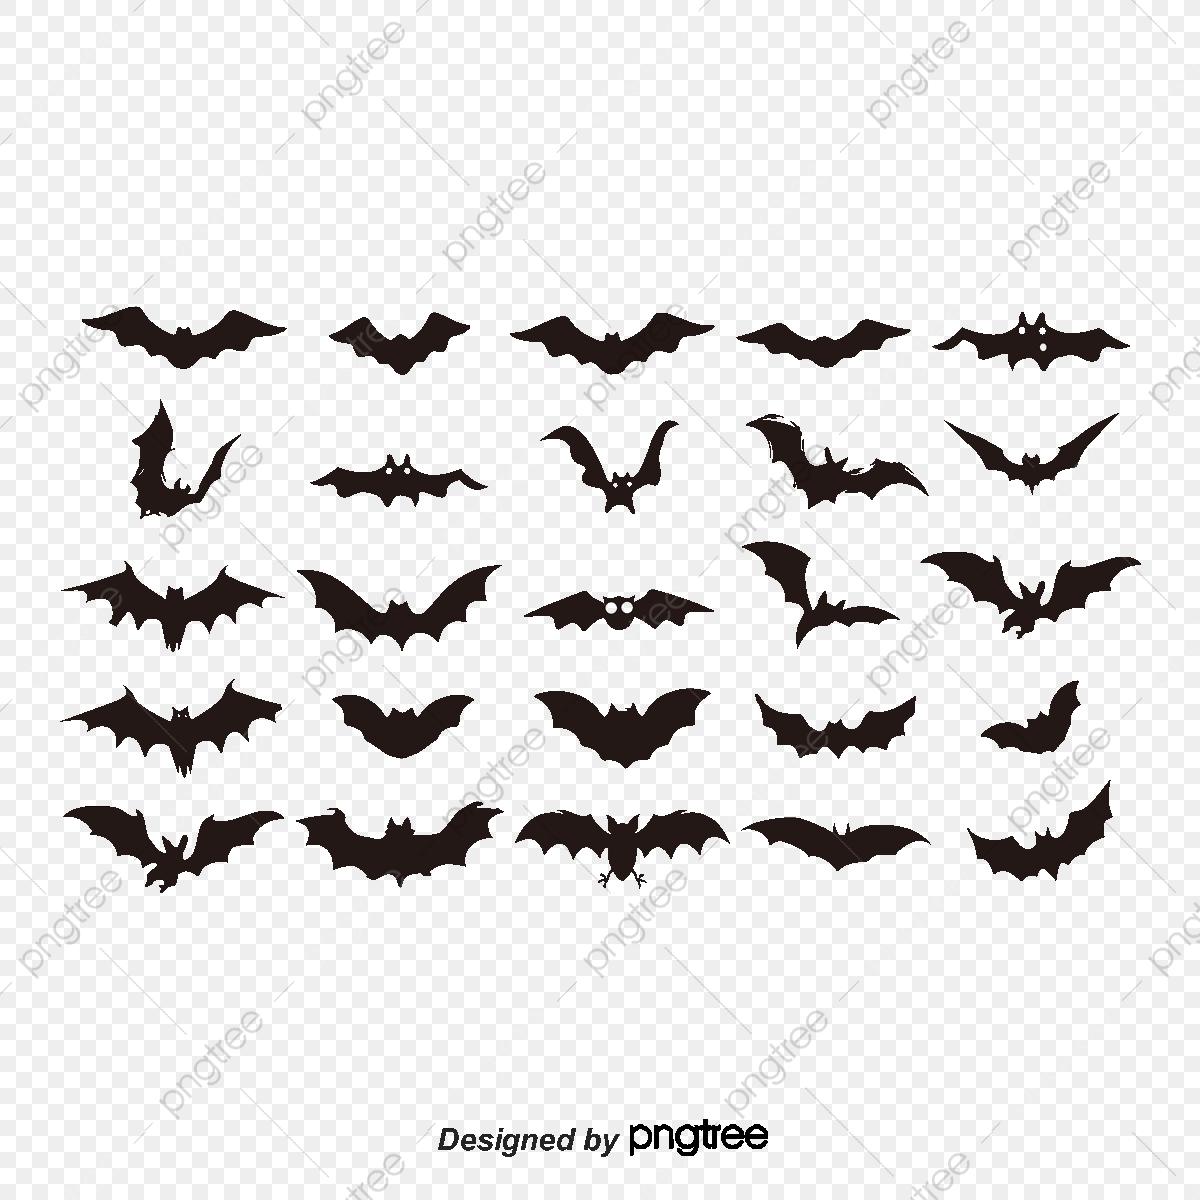 Halloween Bat Vector At Vectorified